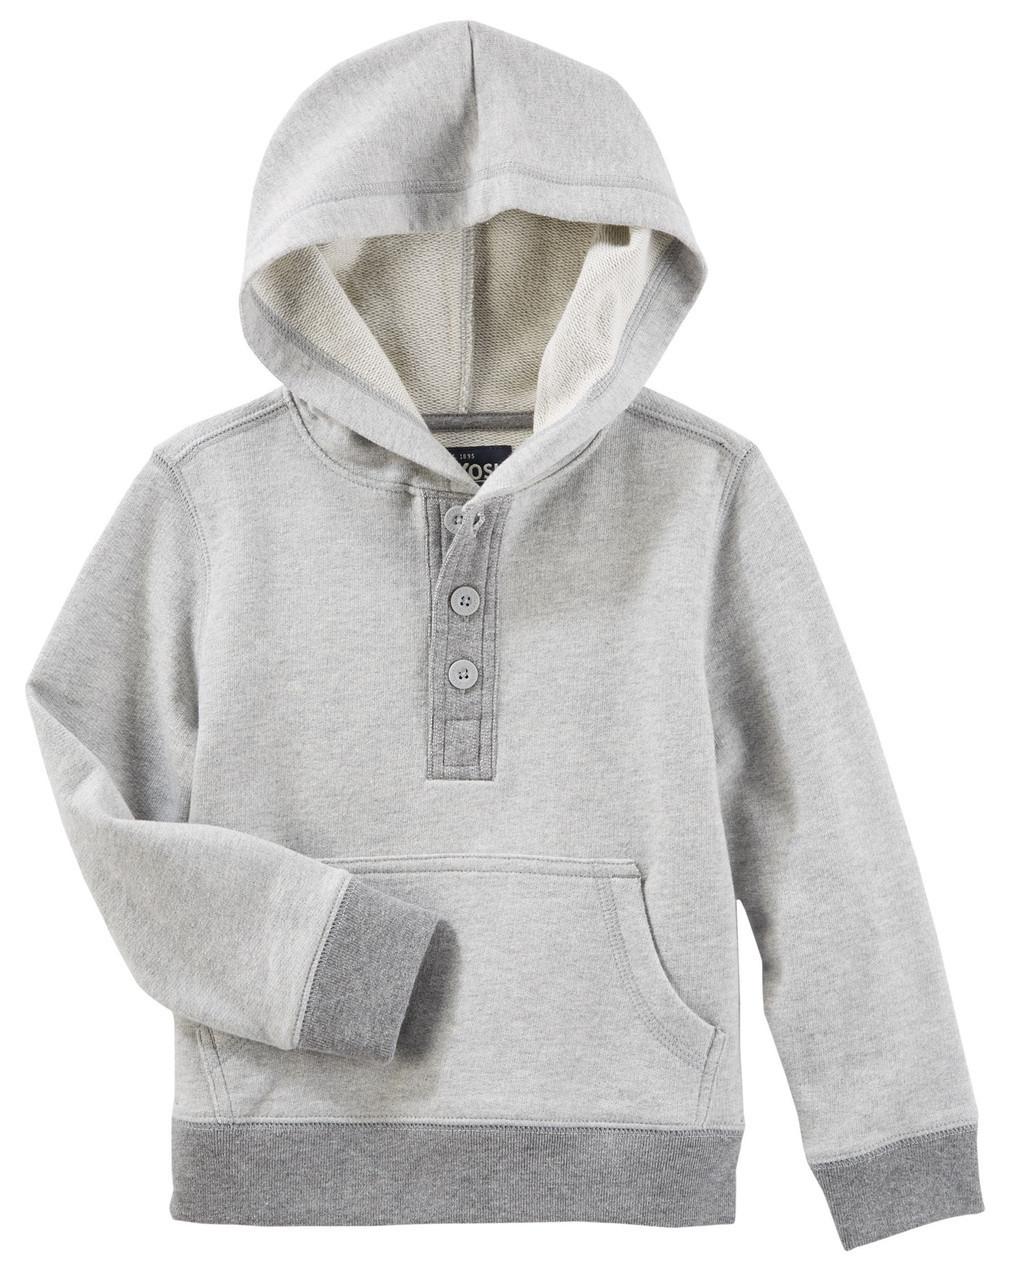 Пуловер Oshkosh French Terry 7 лет